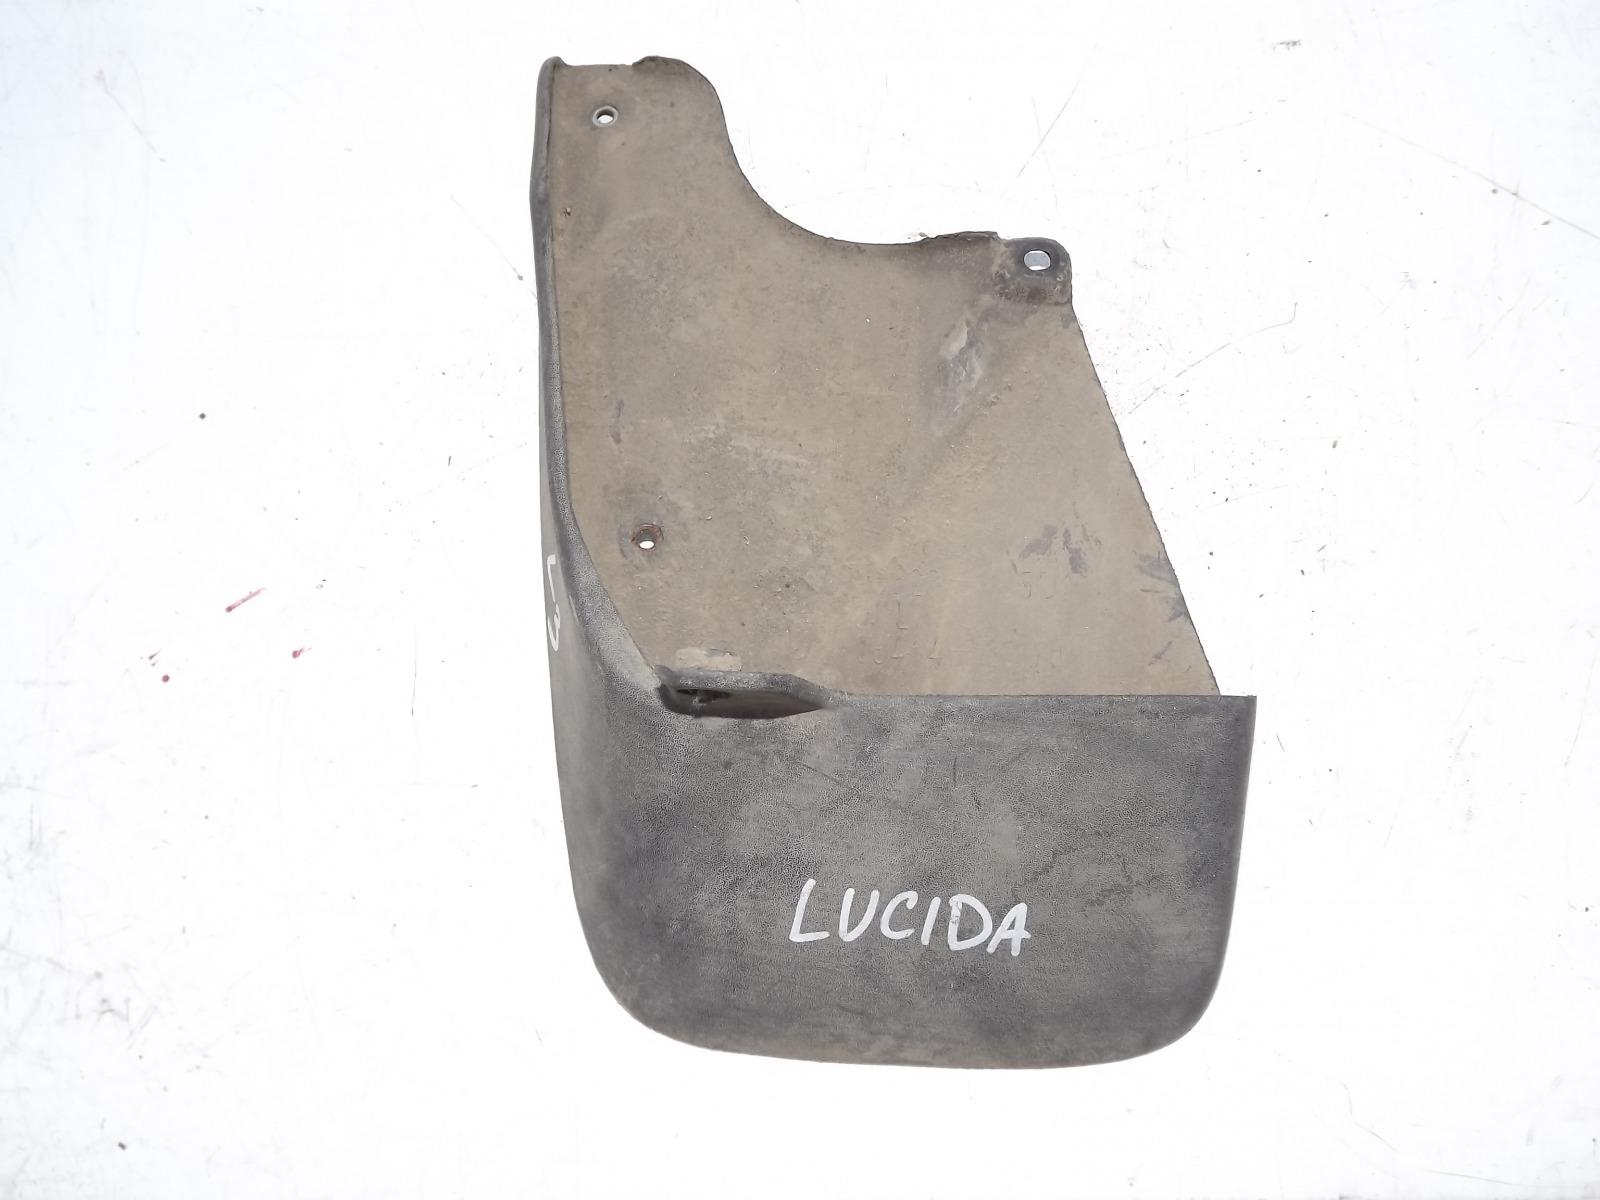 Брызговик Toyota Lucida TCR10 задний левый (б/у)